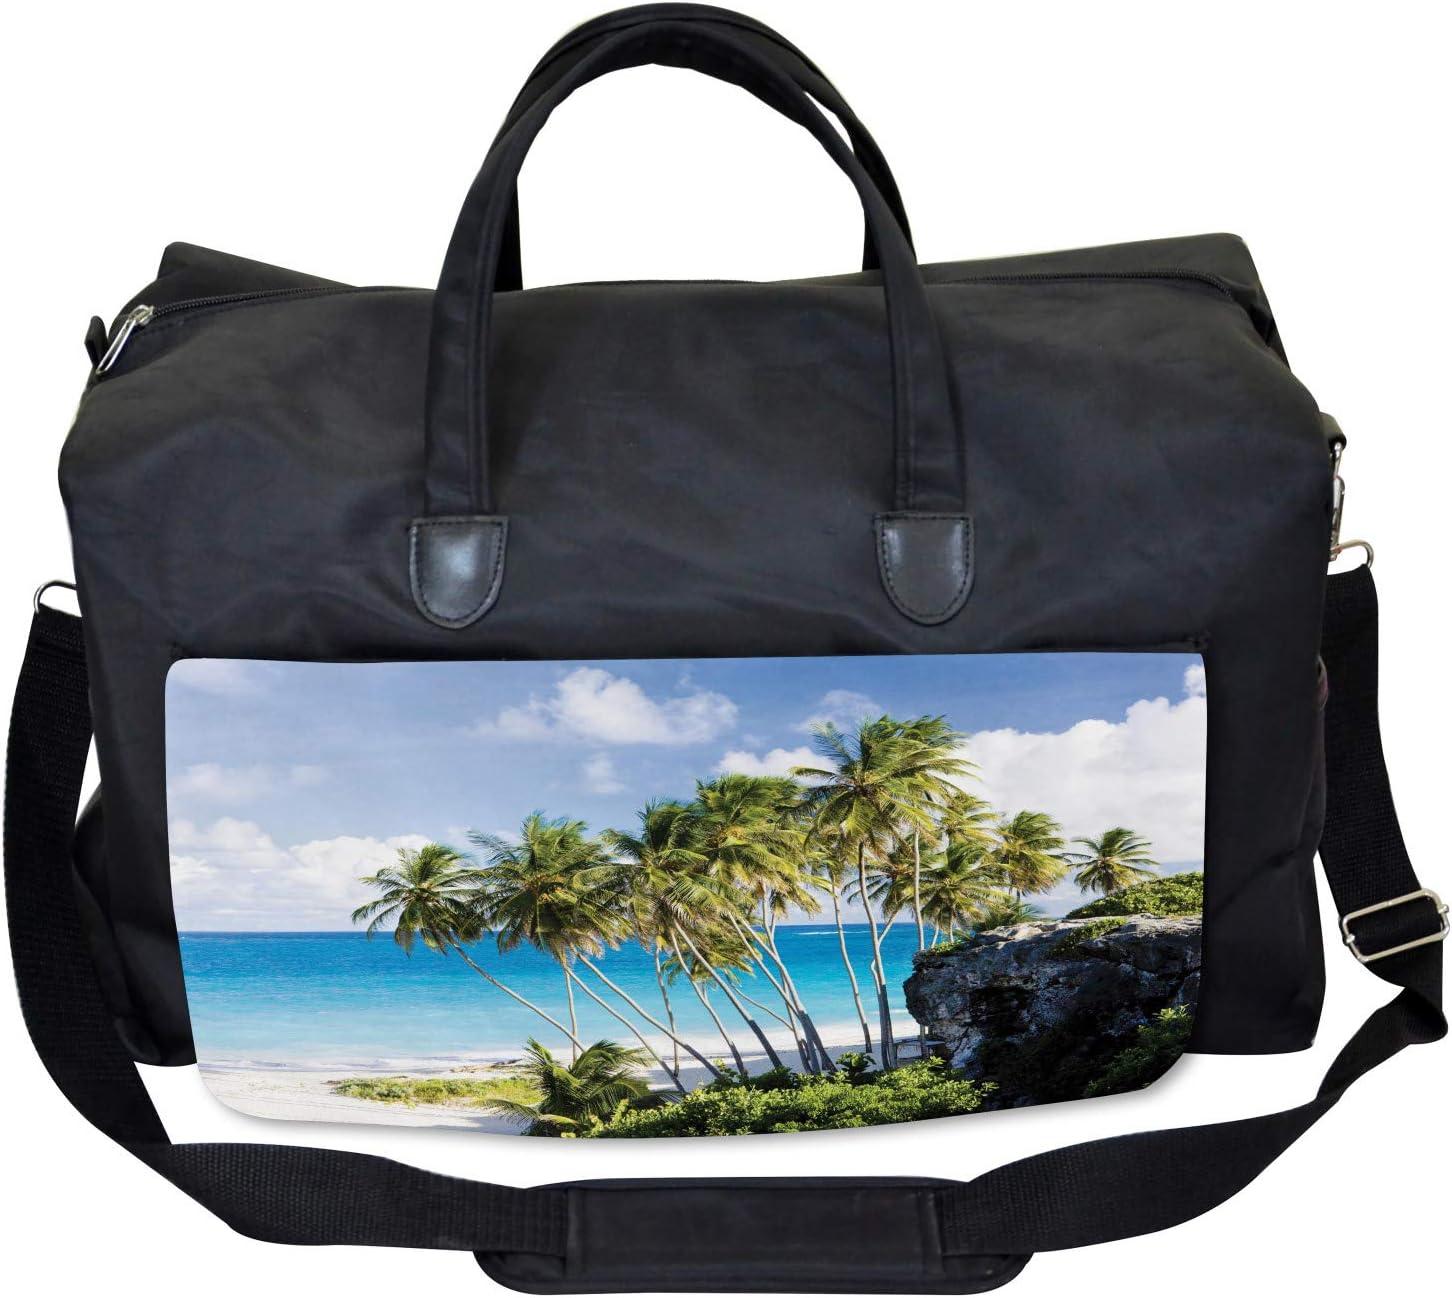 Large Weekender Carry-on Ocean Exotic Beach Ambesonne Tropical Gym Bag